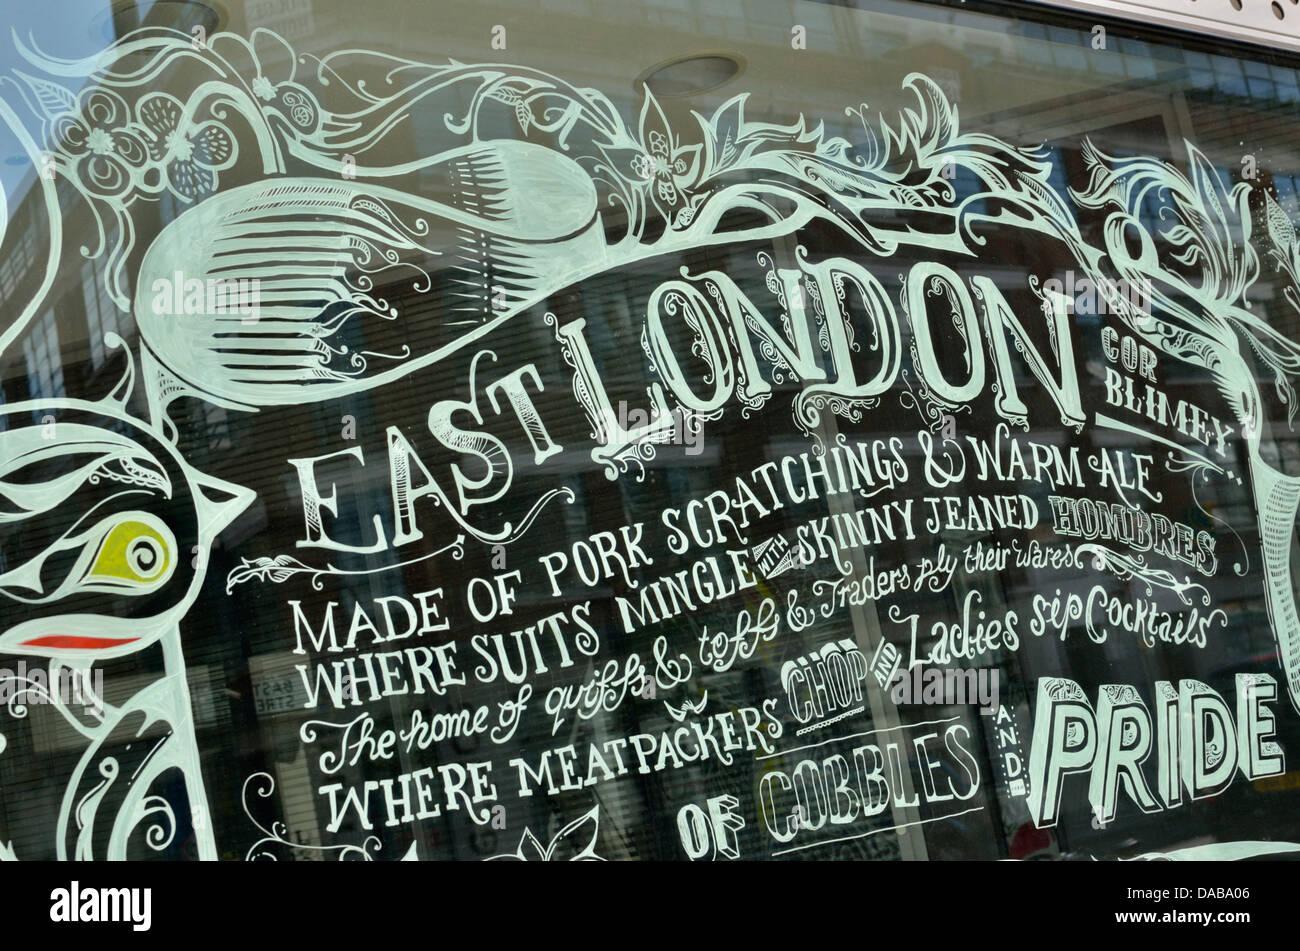 An inscription celebrating East London on a shop window, London, UK - Stock Image